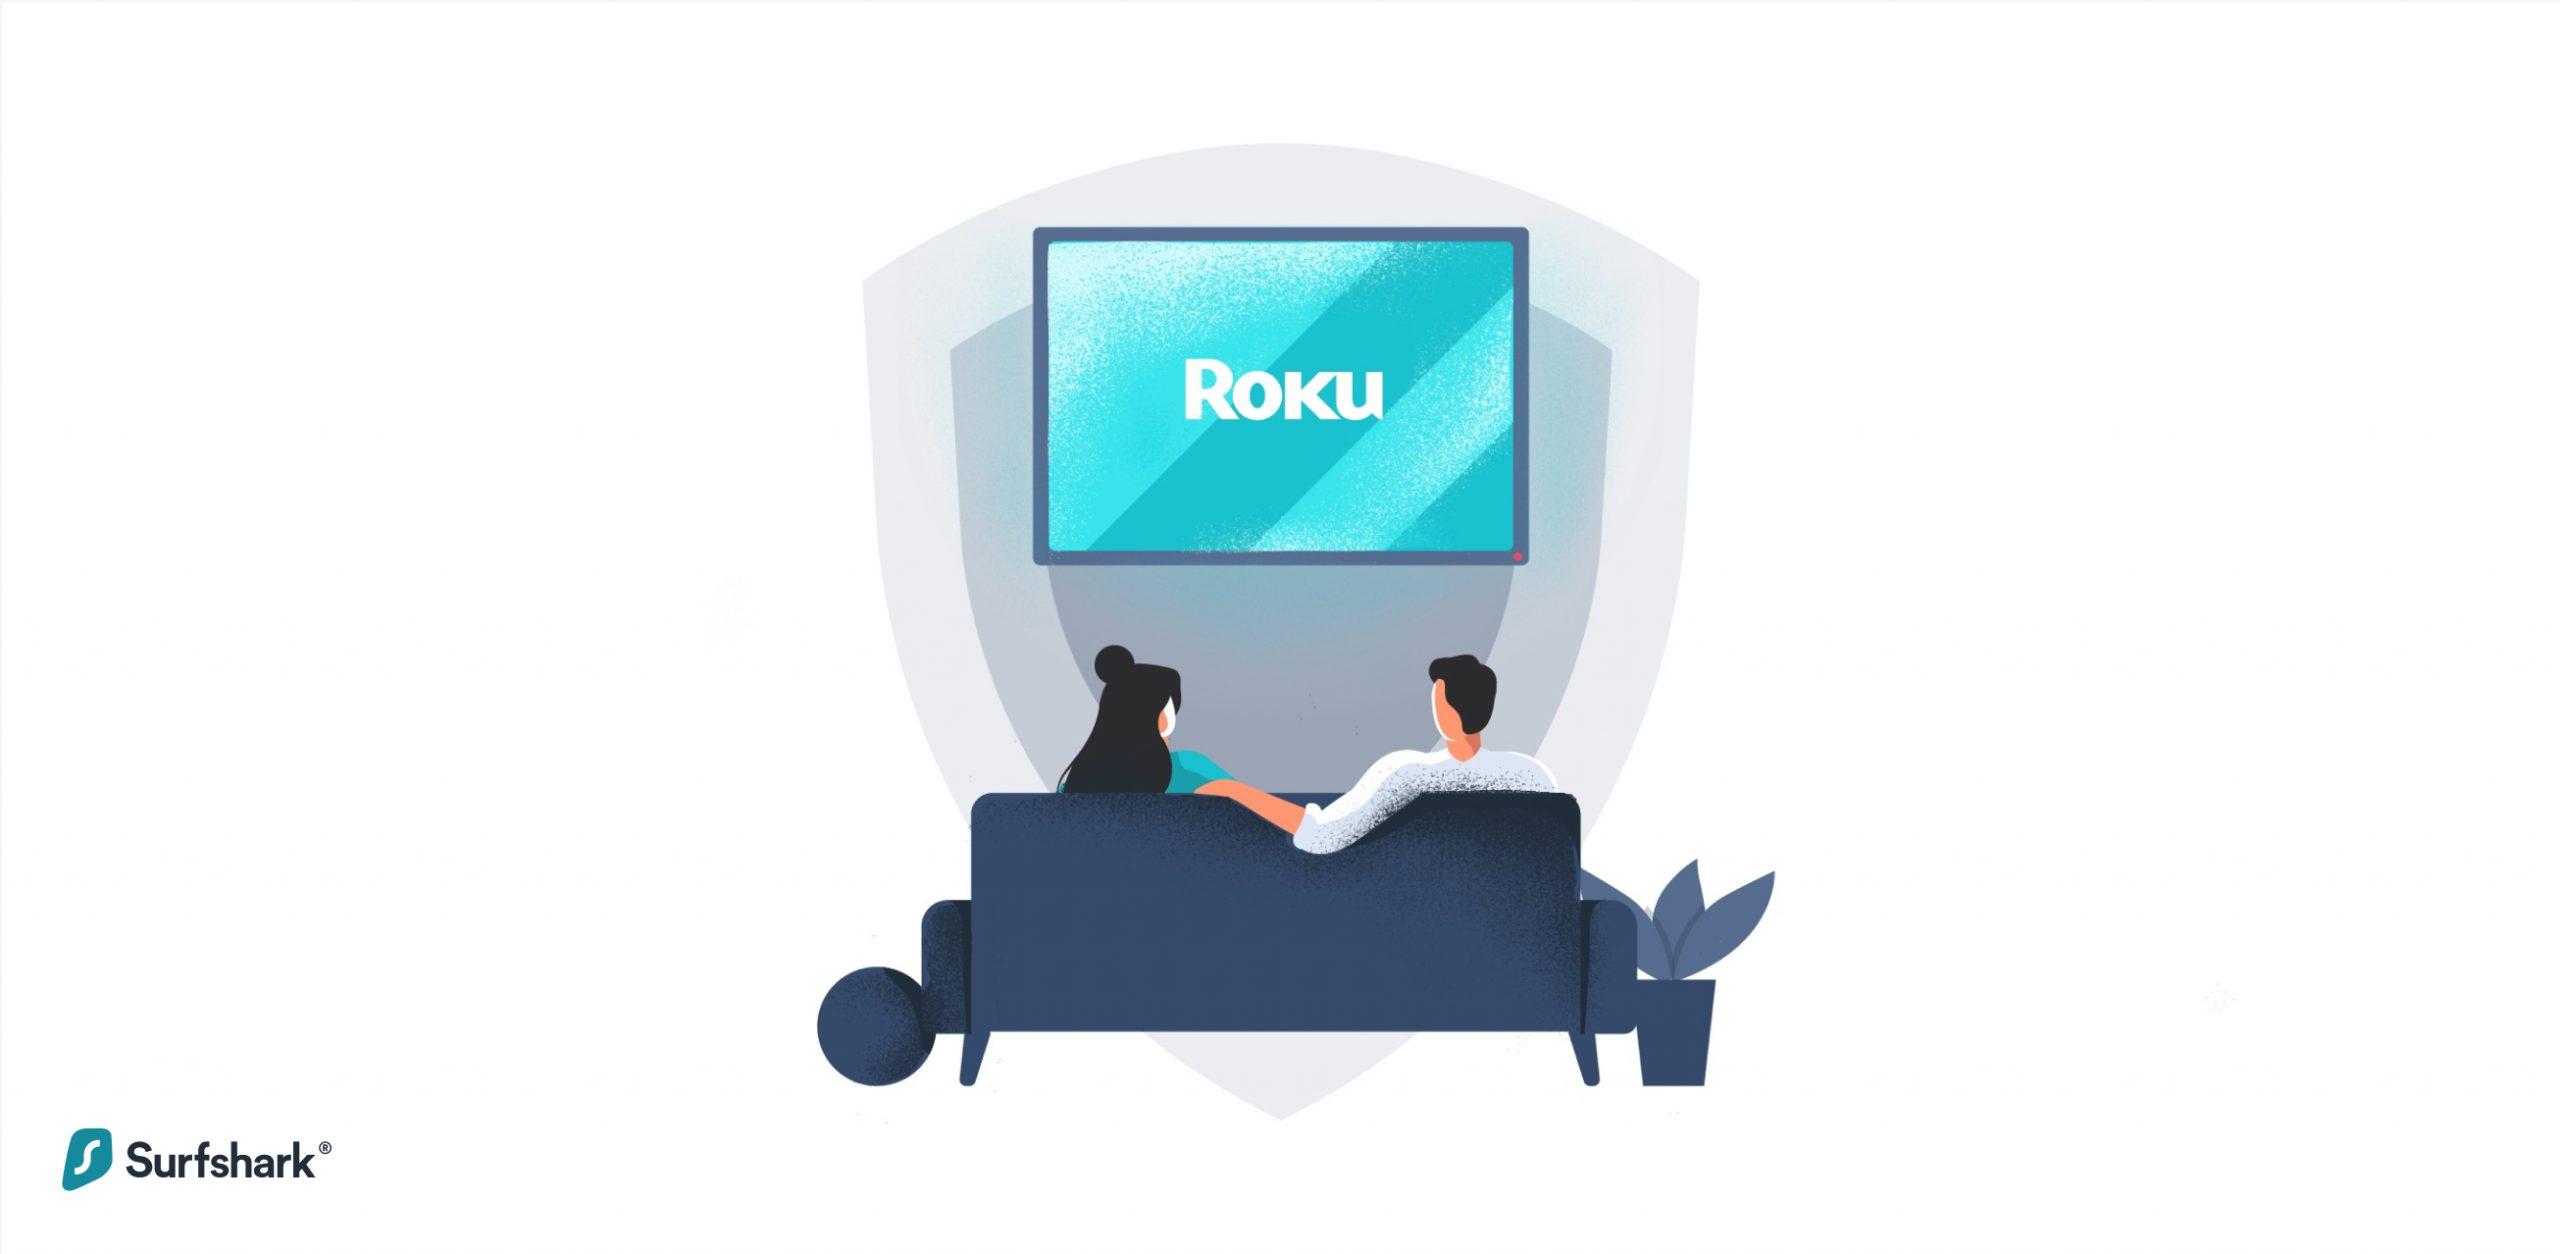 Surfshark Roku graphic